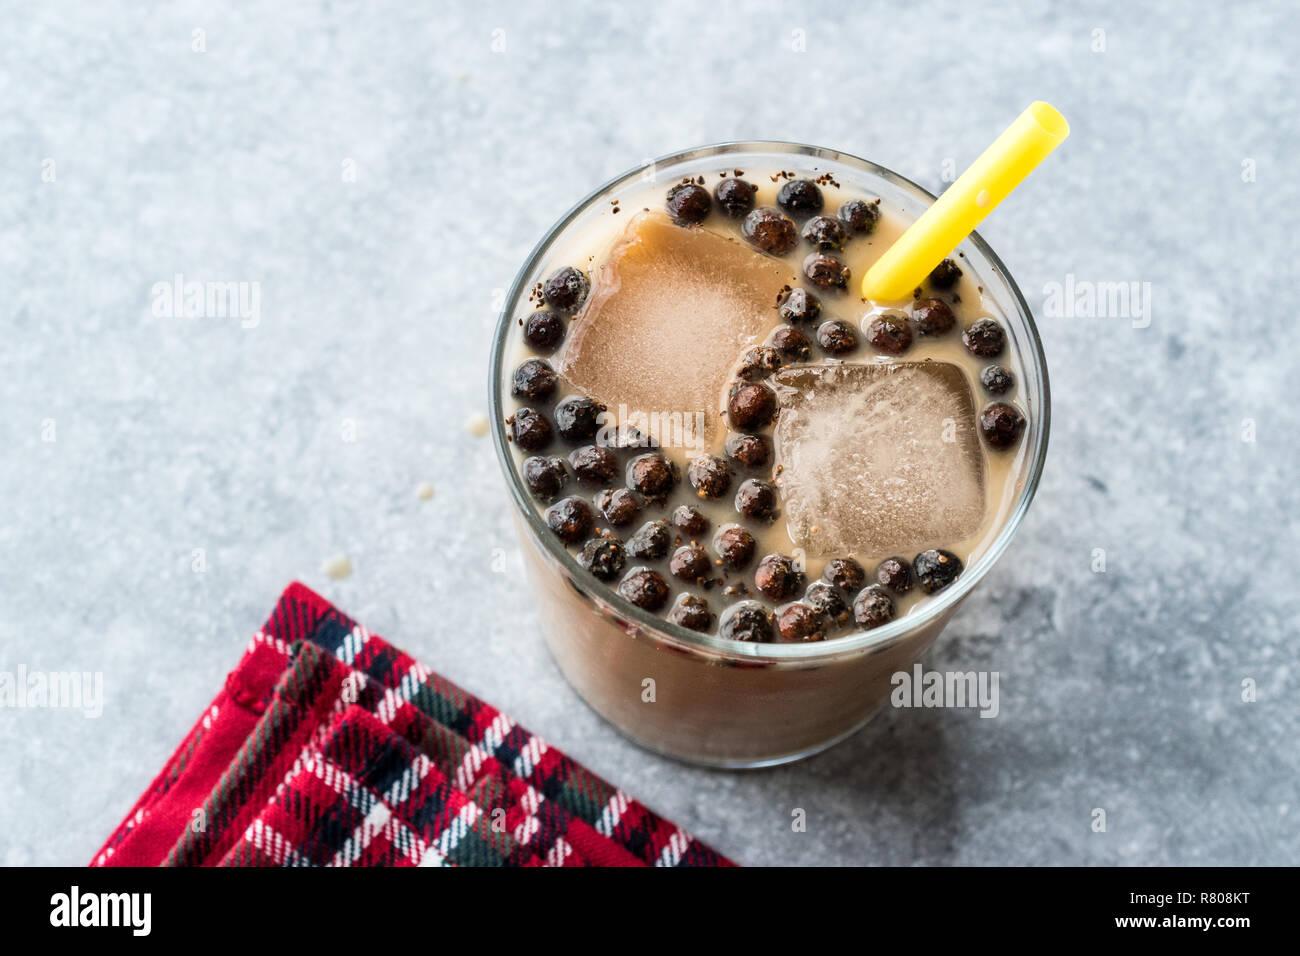 Bubble Milk Green Tea With Tapioca High Resolution Stock ...